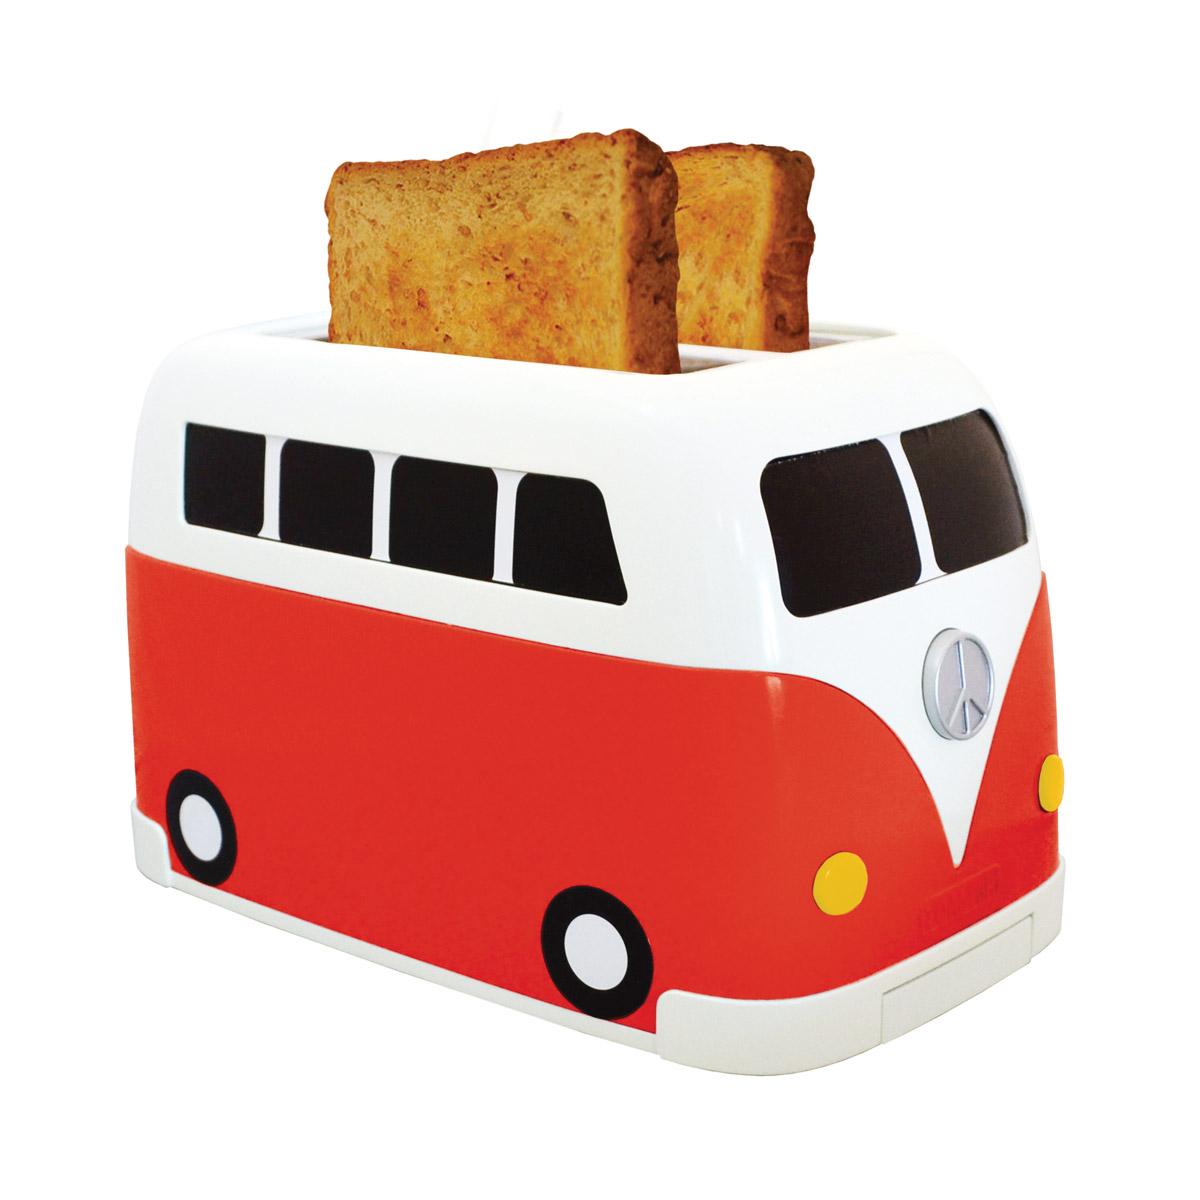 Toaster Campervan<br>Series: Toaster Cam